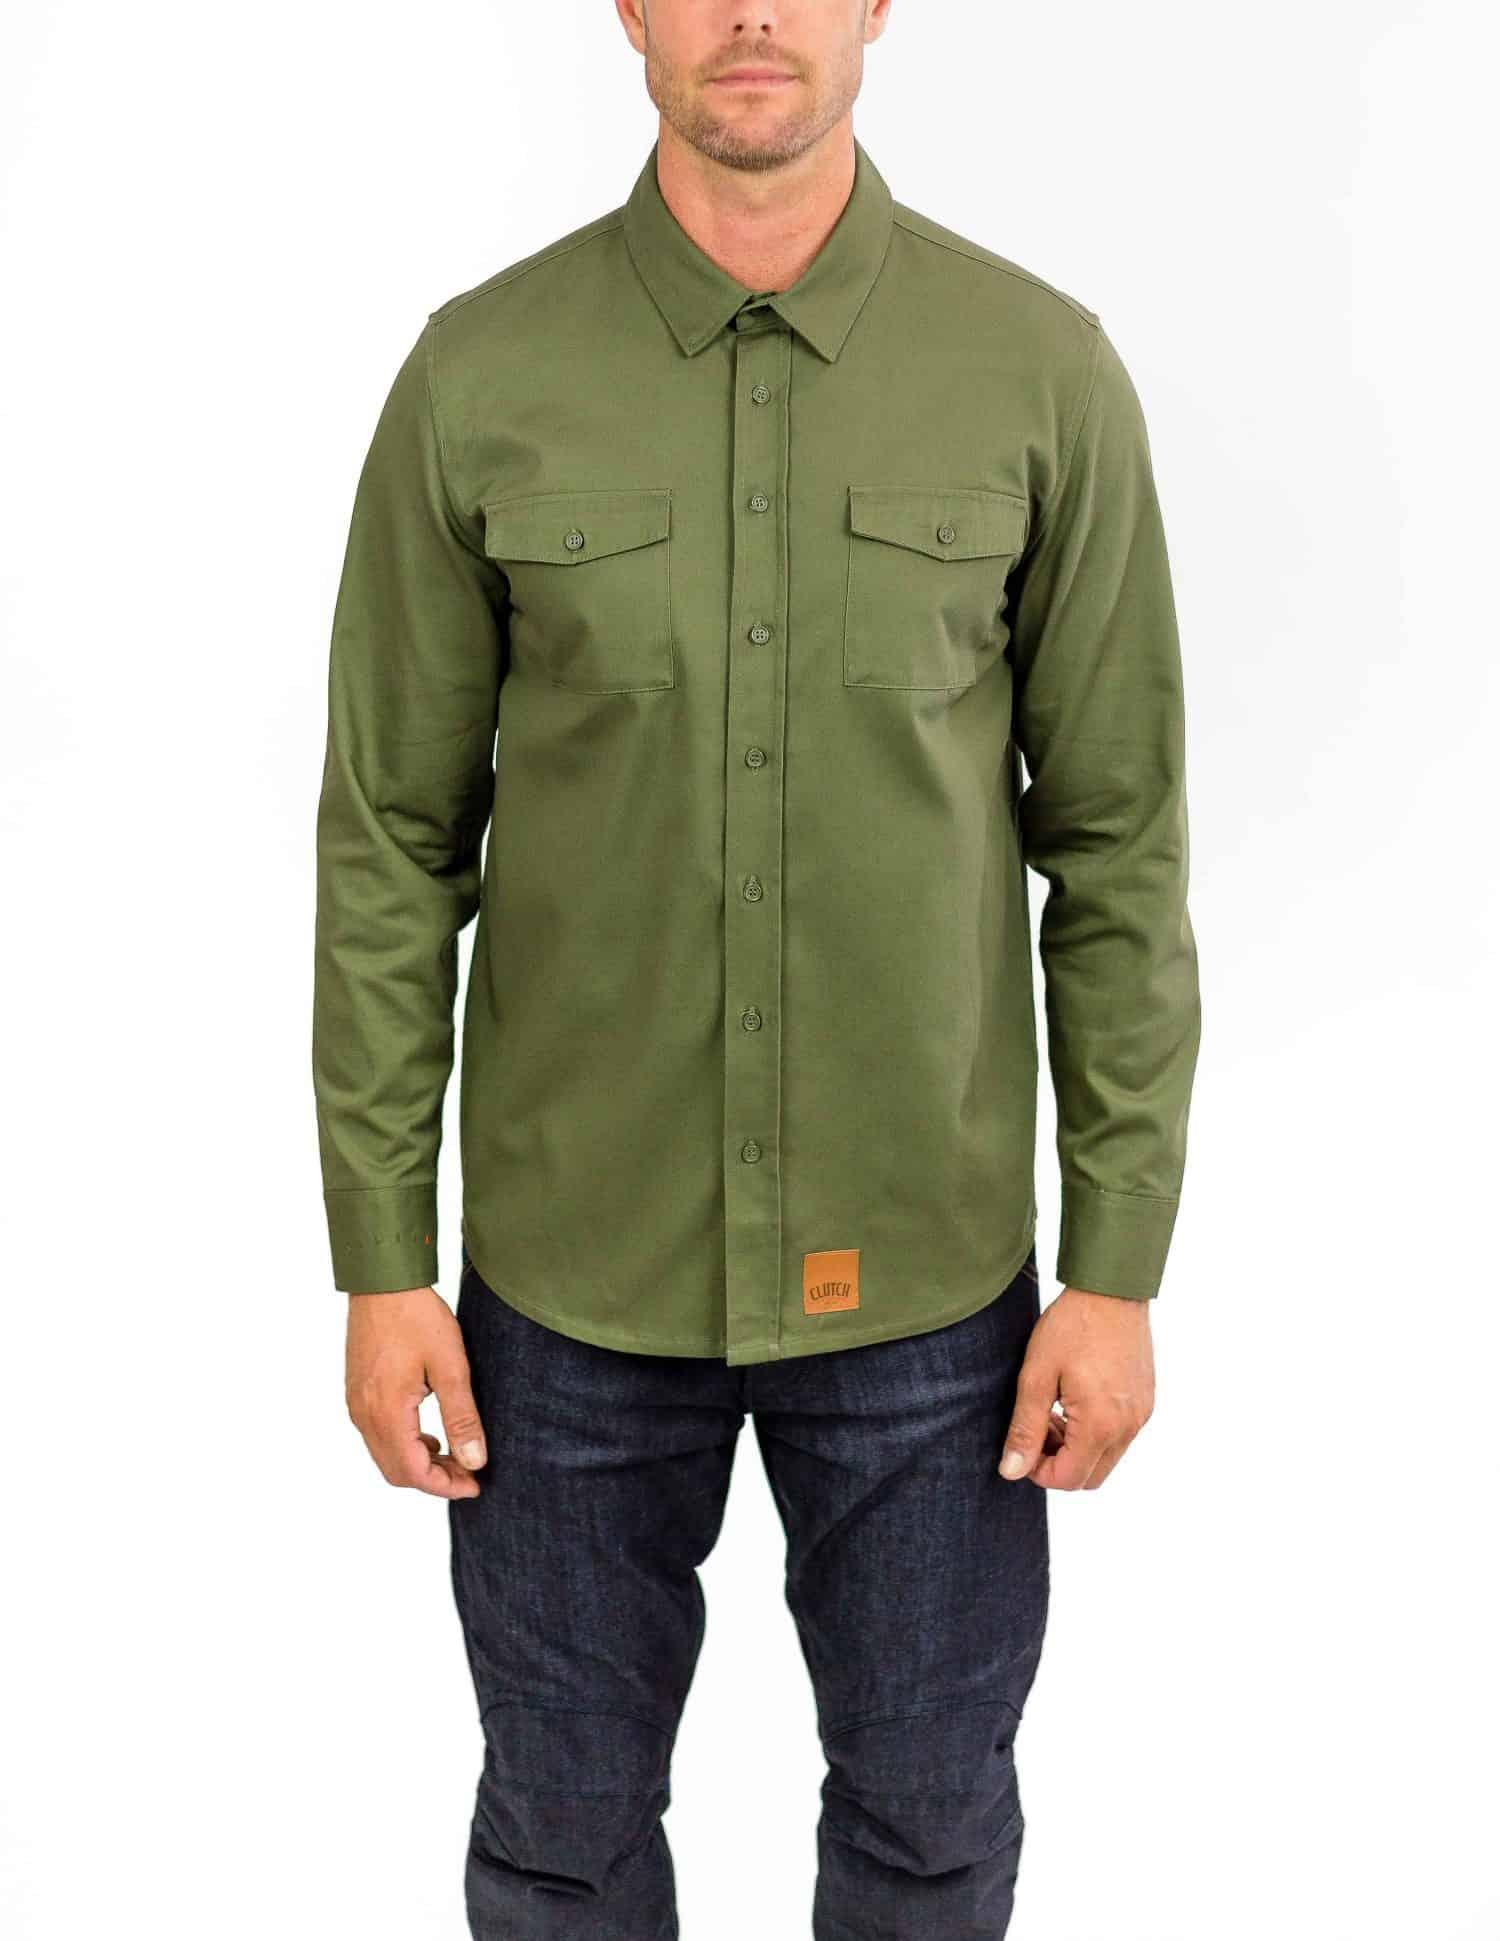 Recon Military Green – Long Sleeve Riding Shirt